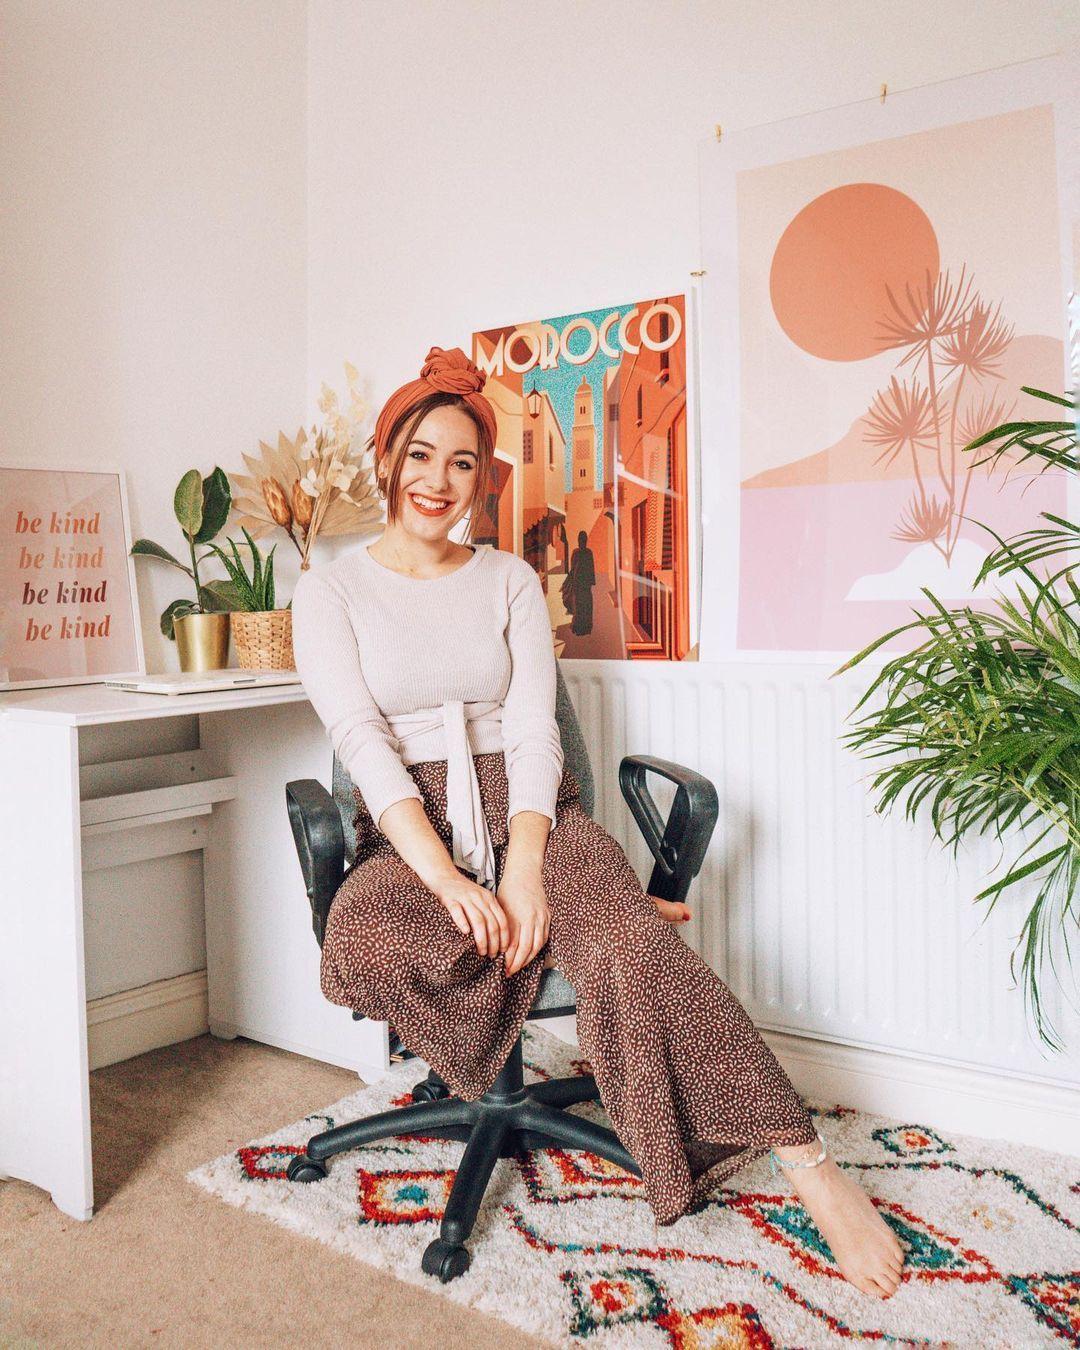 My New Office - London, United Kingdom | Sabina Trojanova | Instagram